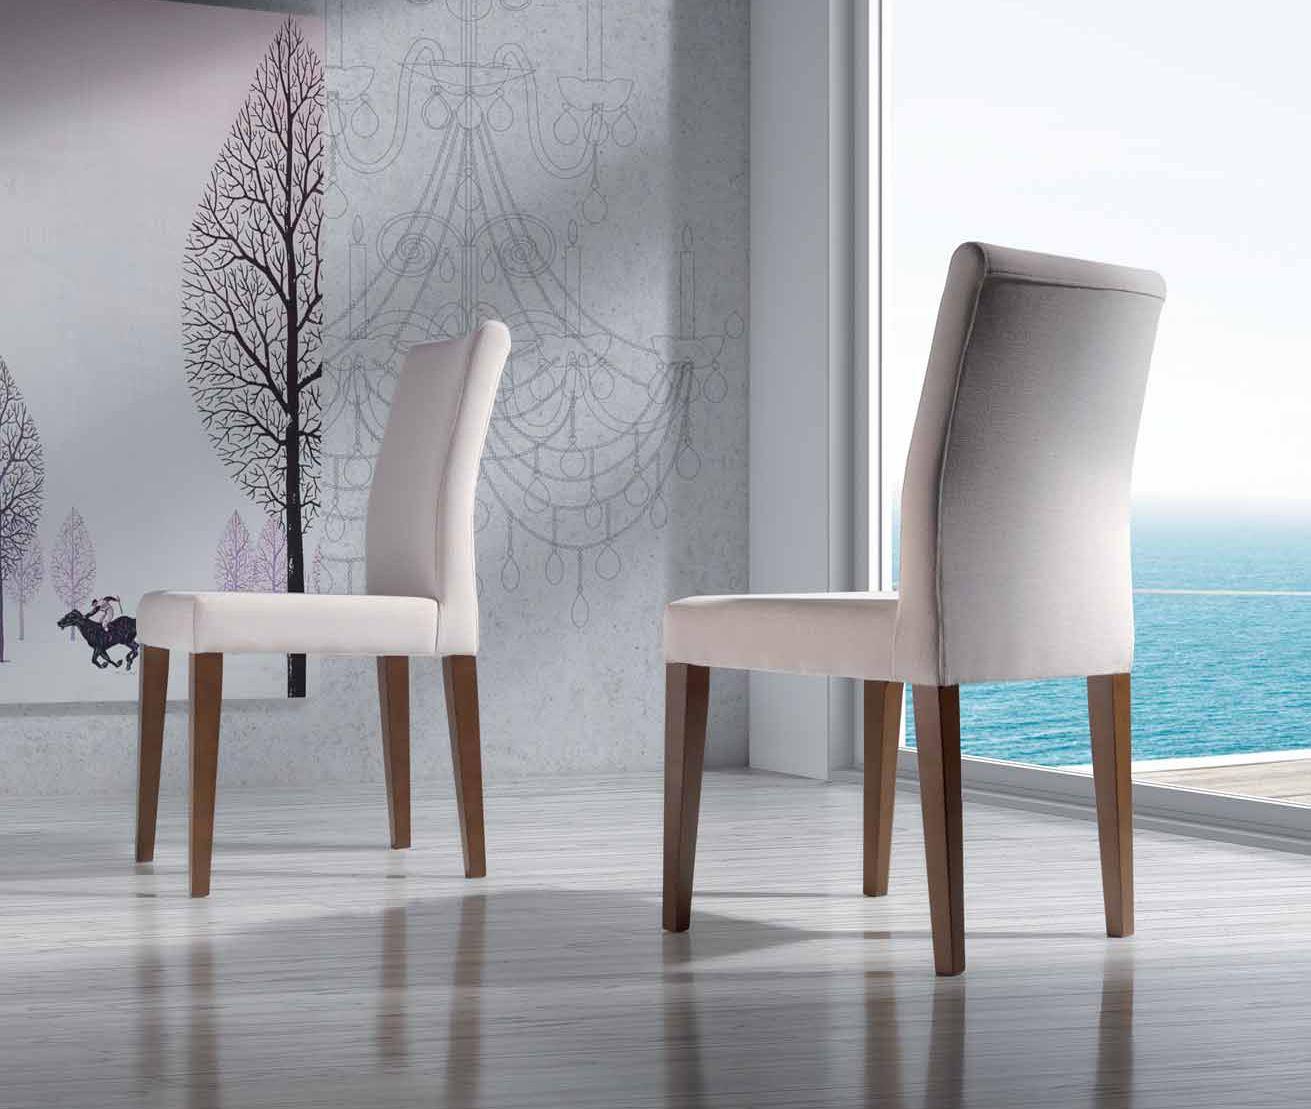 Silla moderna de comedor tapizada y patas en madera de - Sillas tapizadas modernas ...